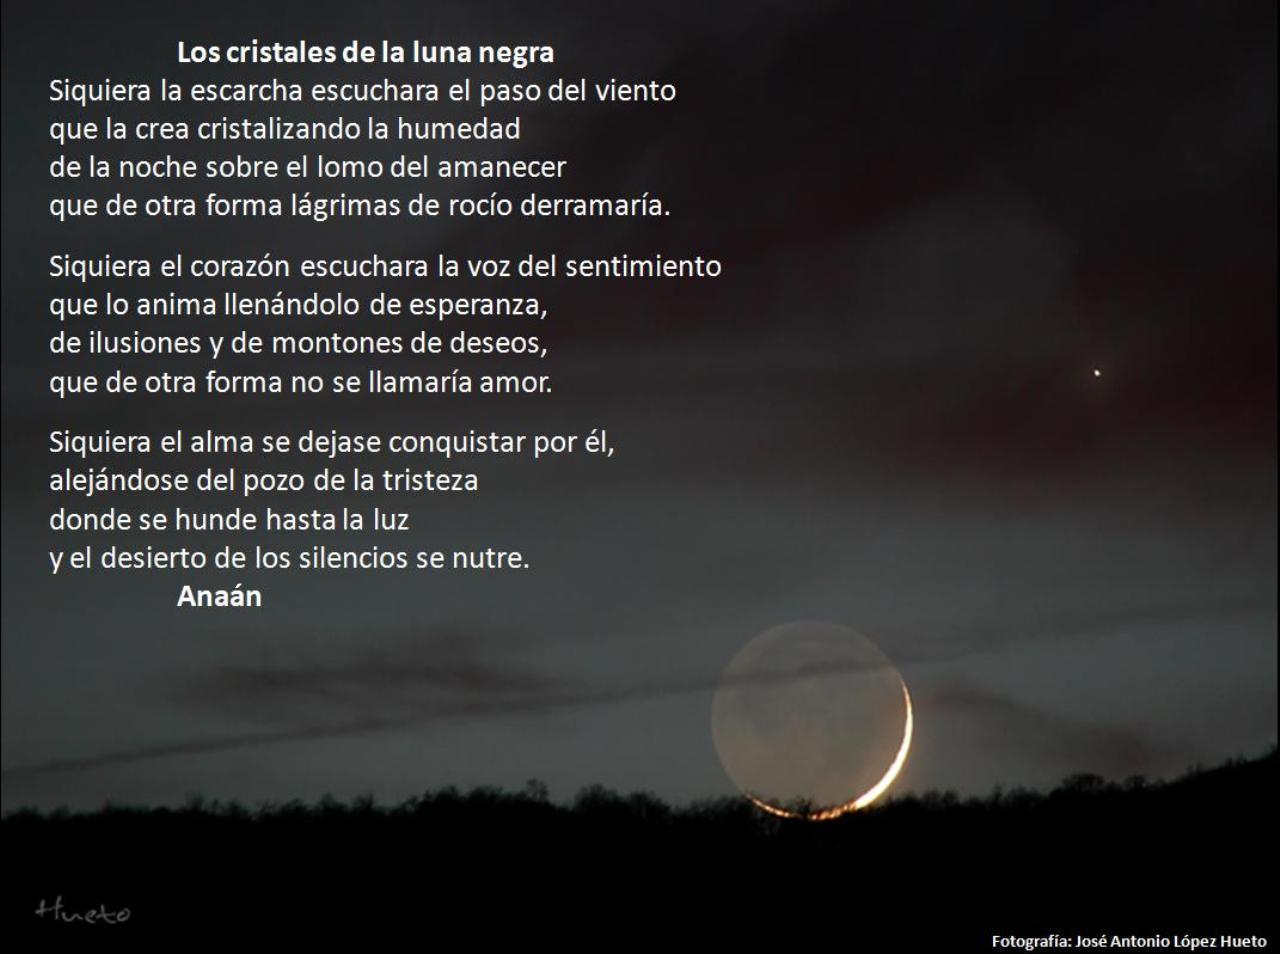 Anaan